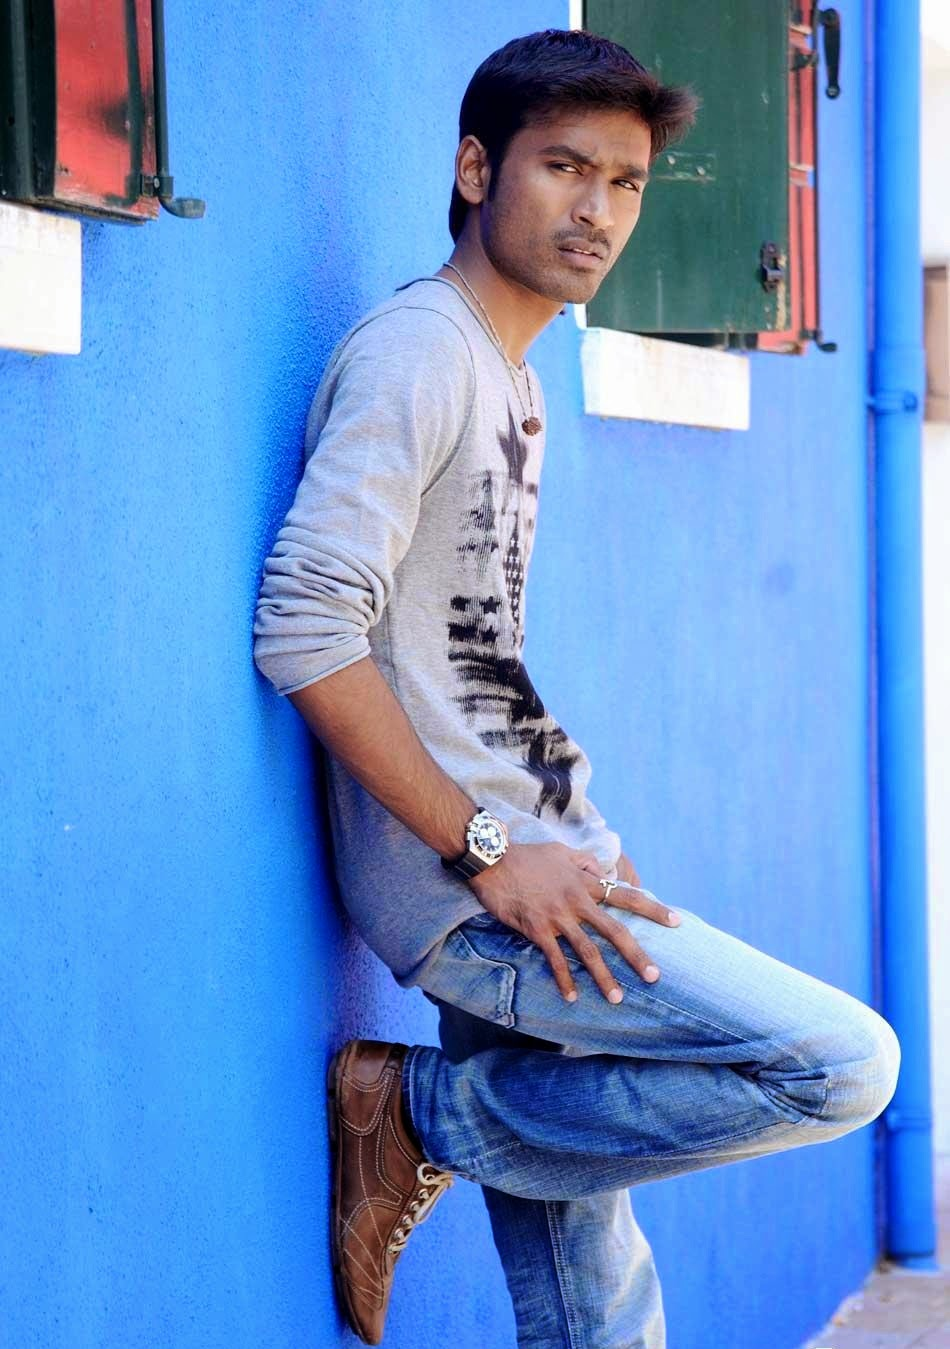 kuttydownload: dhanush hd images|dhanush wallpaper|dhanush hd photos